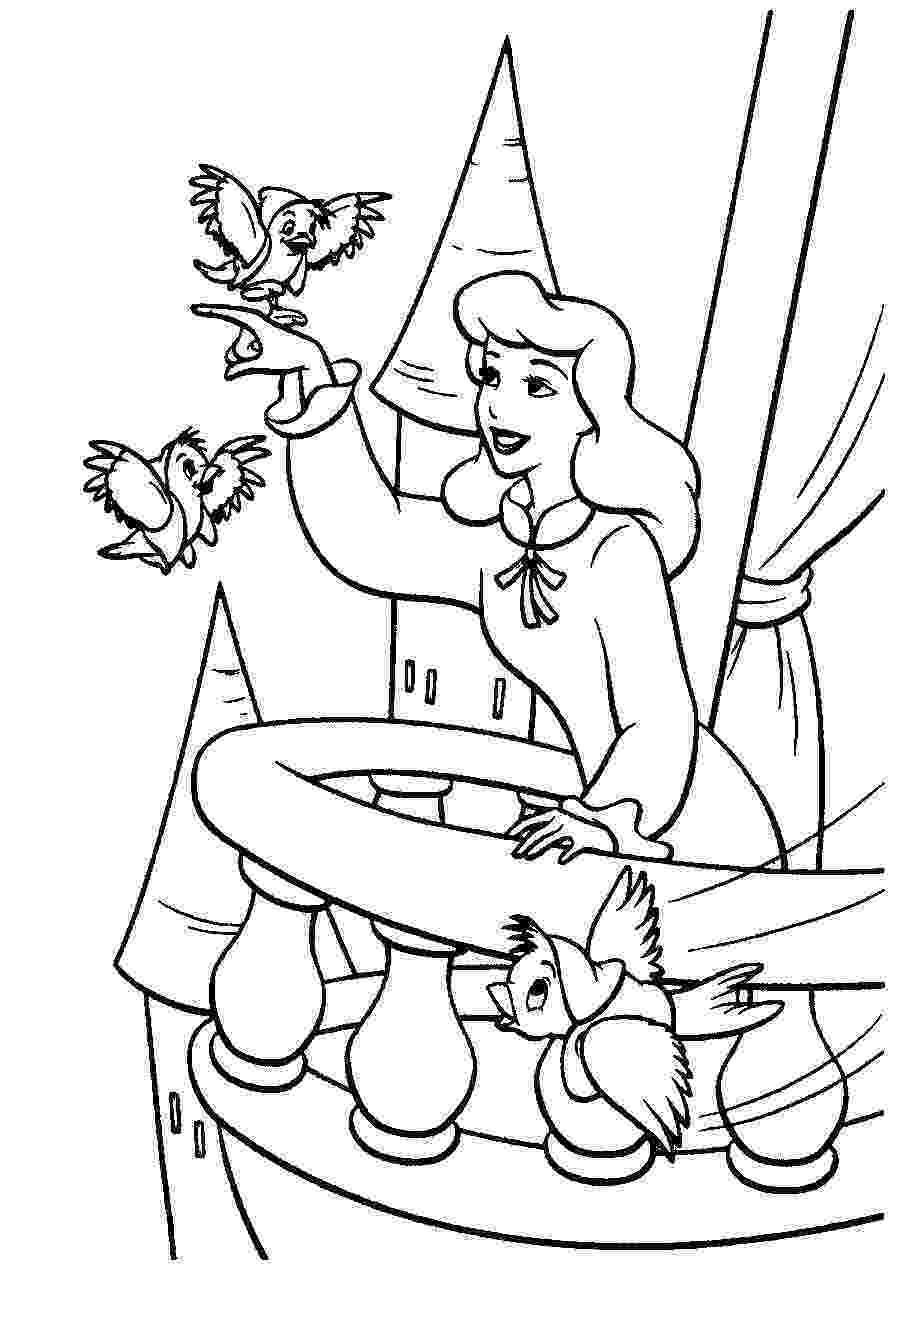 cinderella printable coloring pages free printable cinderella activity sheets and coloring pages coloring cinderella printable